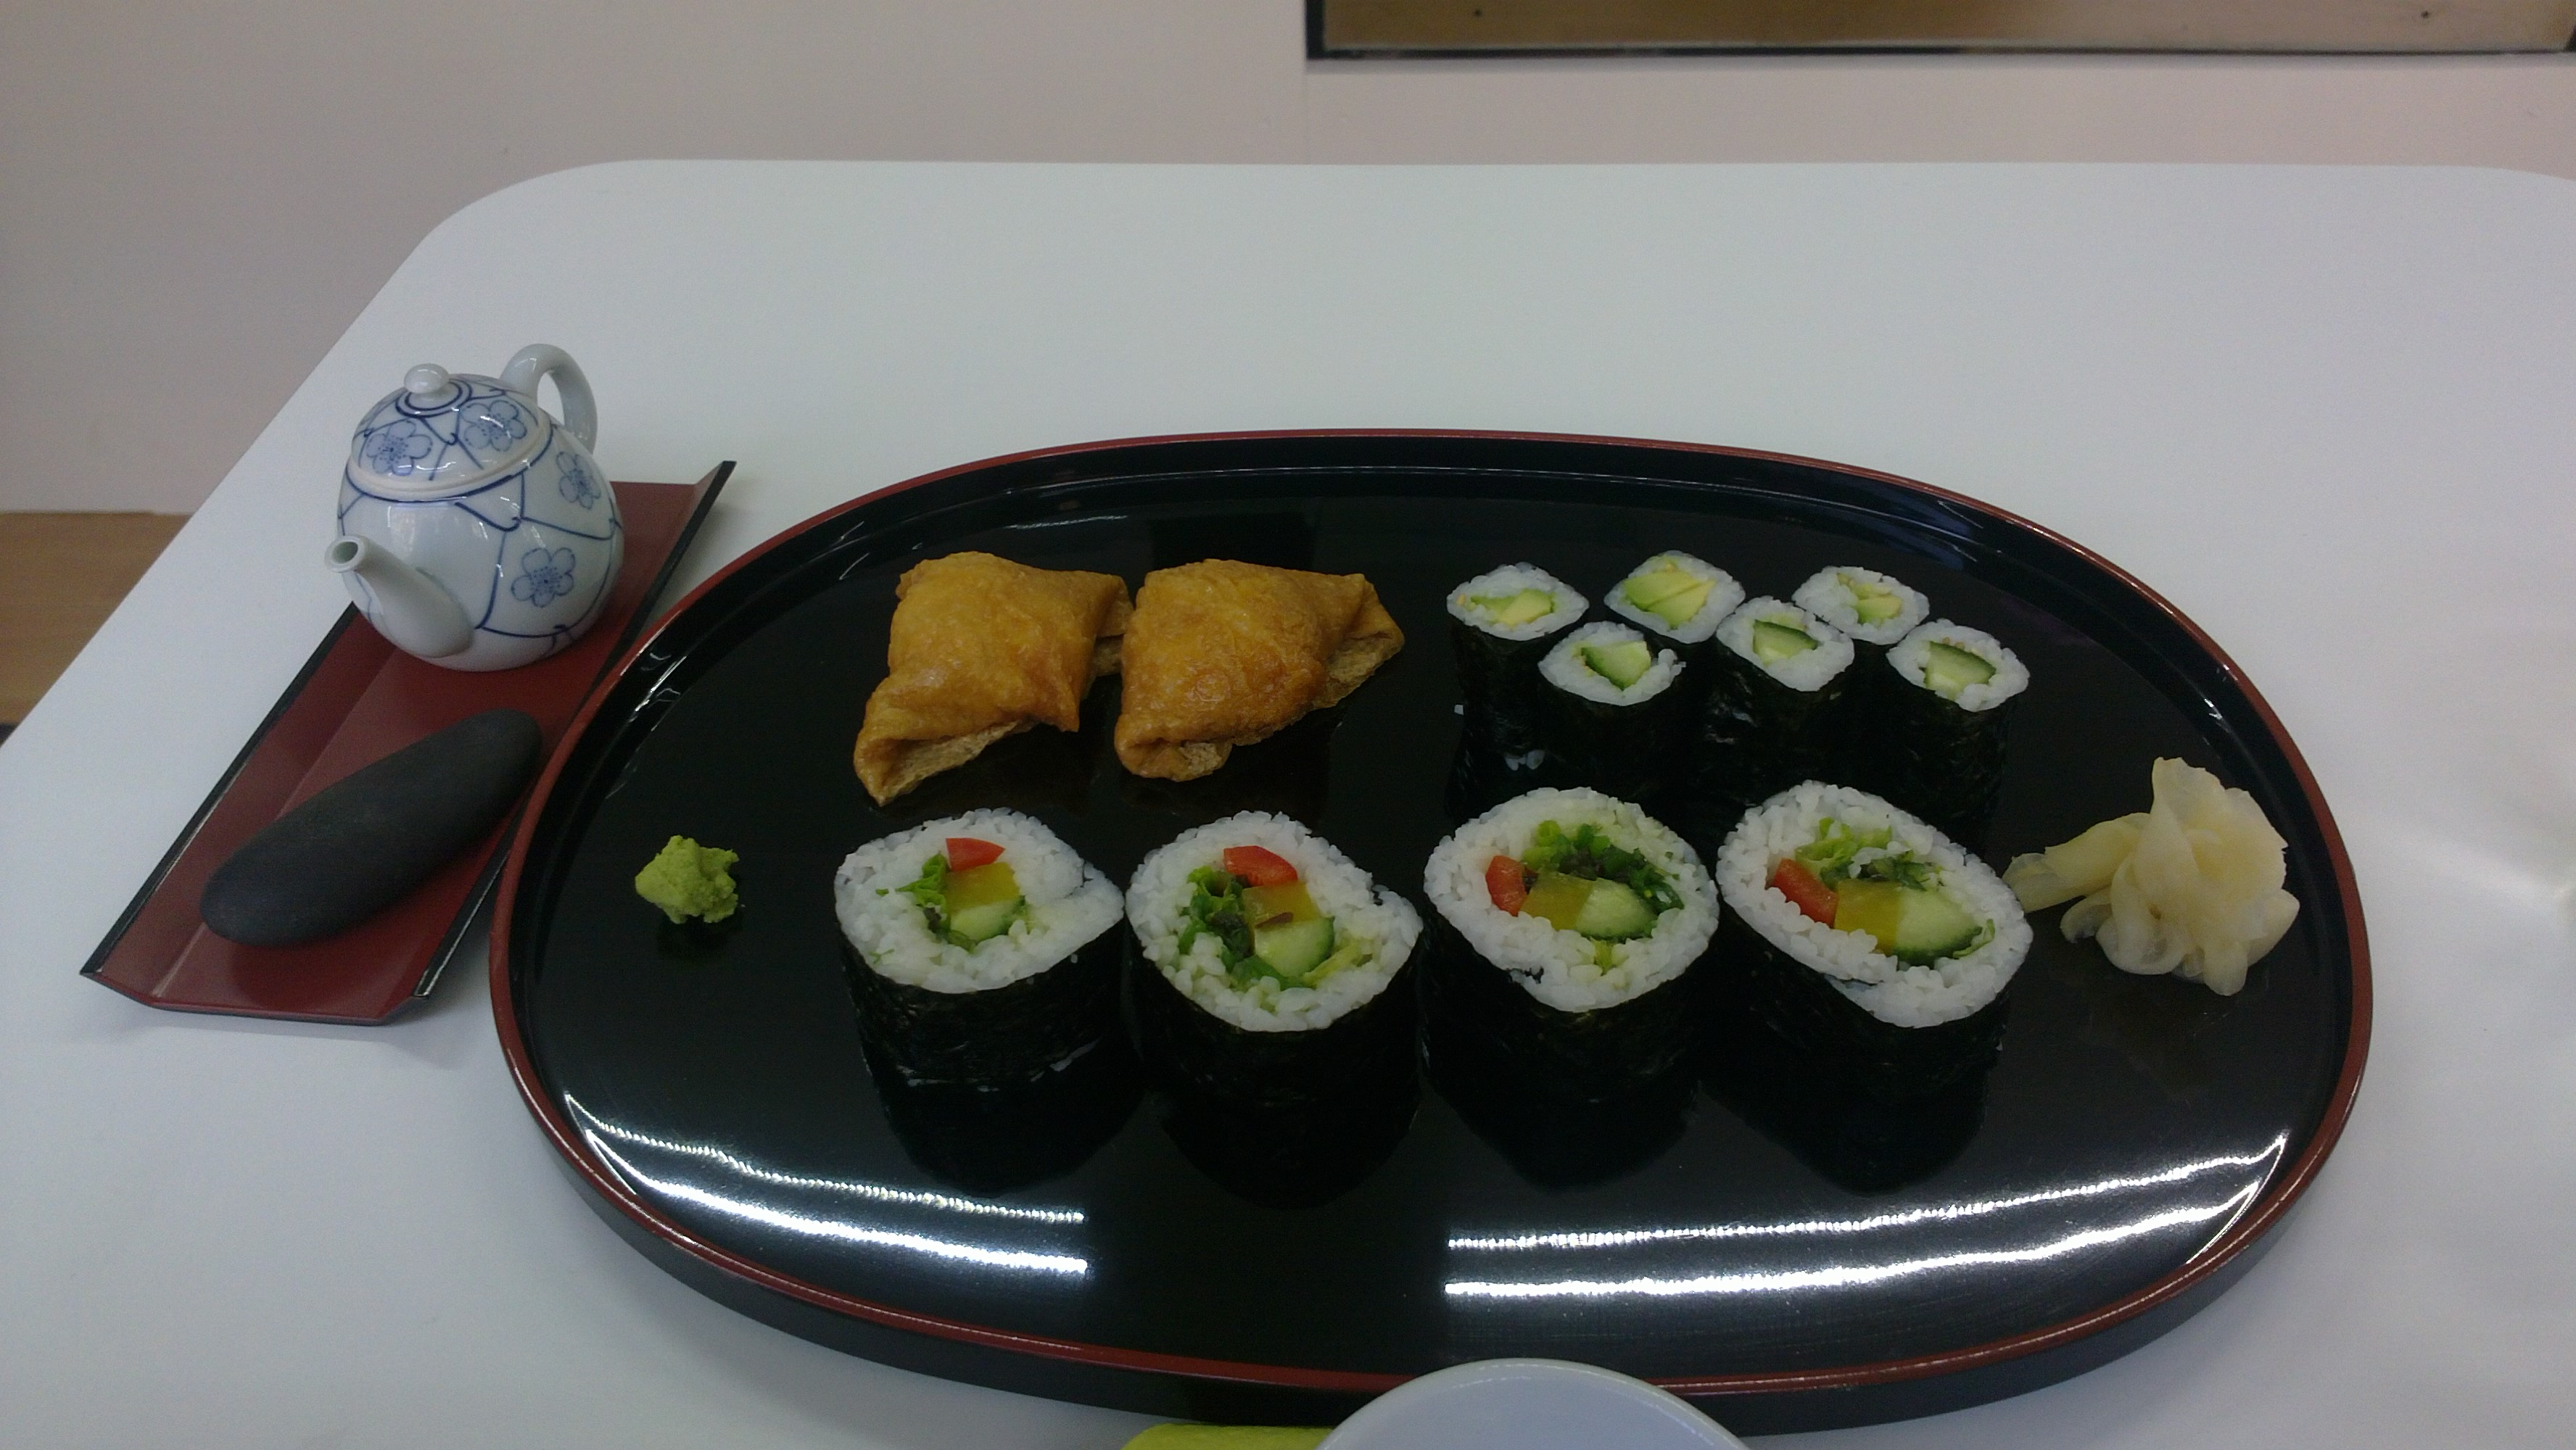 sushi wa.gocoro, Helsingfors: Kasvissetti